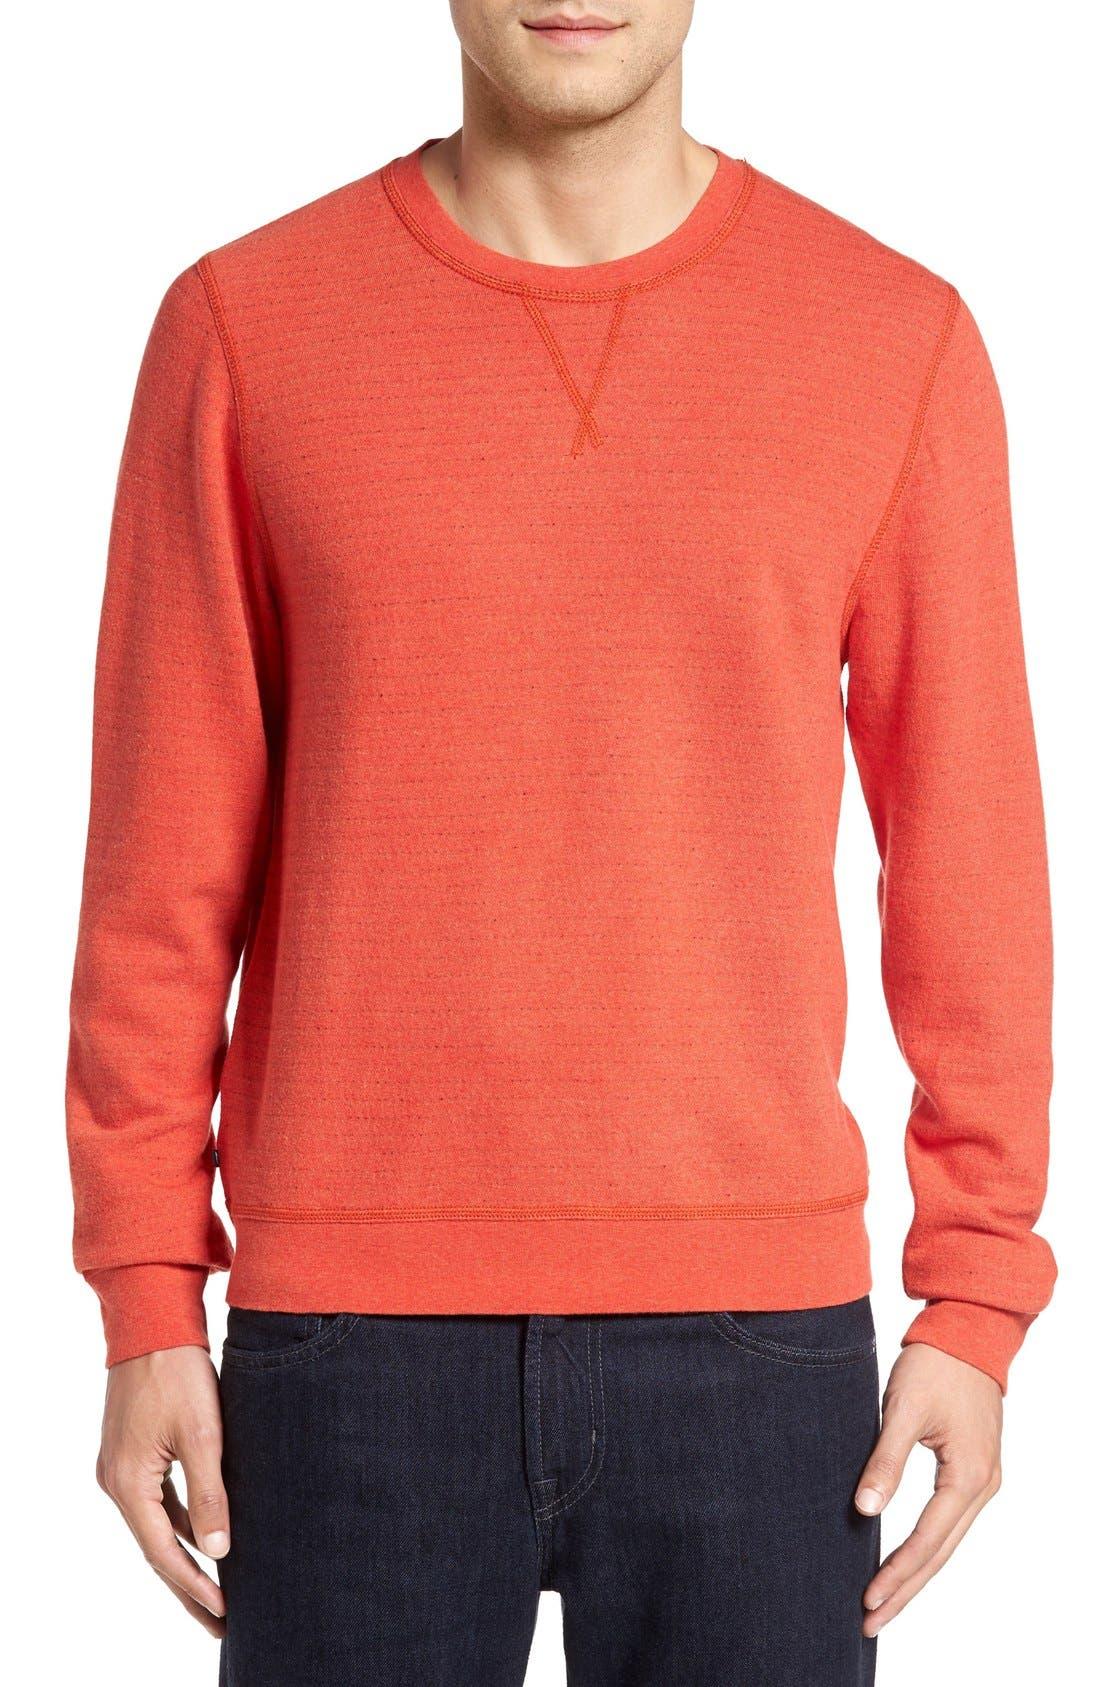 Main Image - Cutter & Buck 'Gleann' French Terry Crewneck Sweatshirt (Big & Tall)